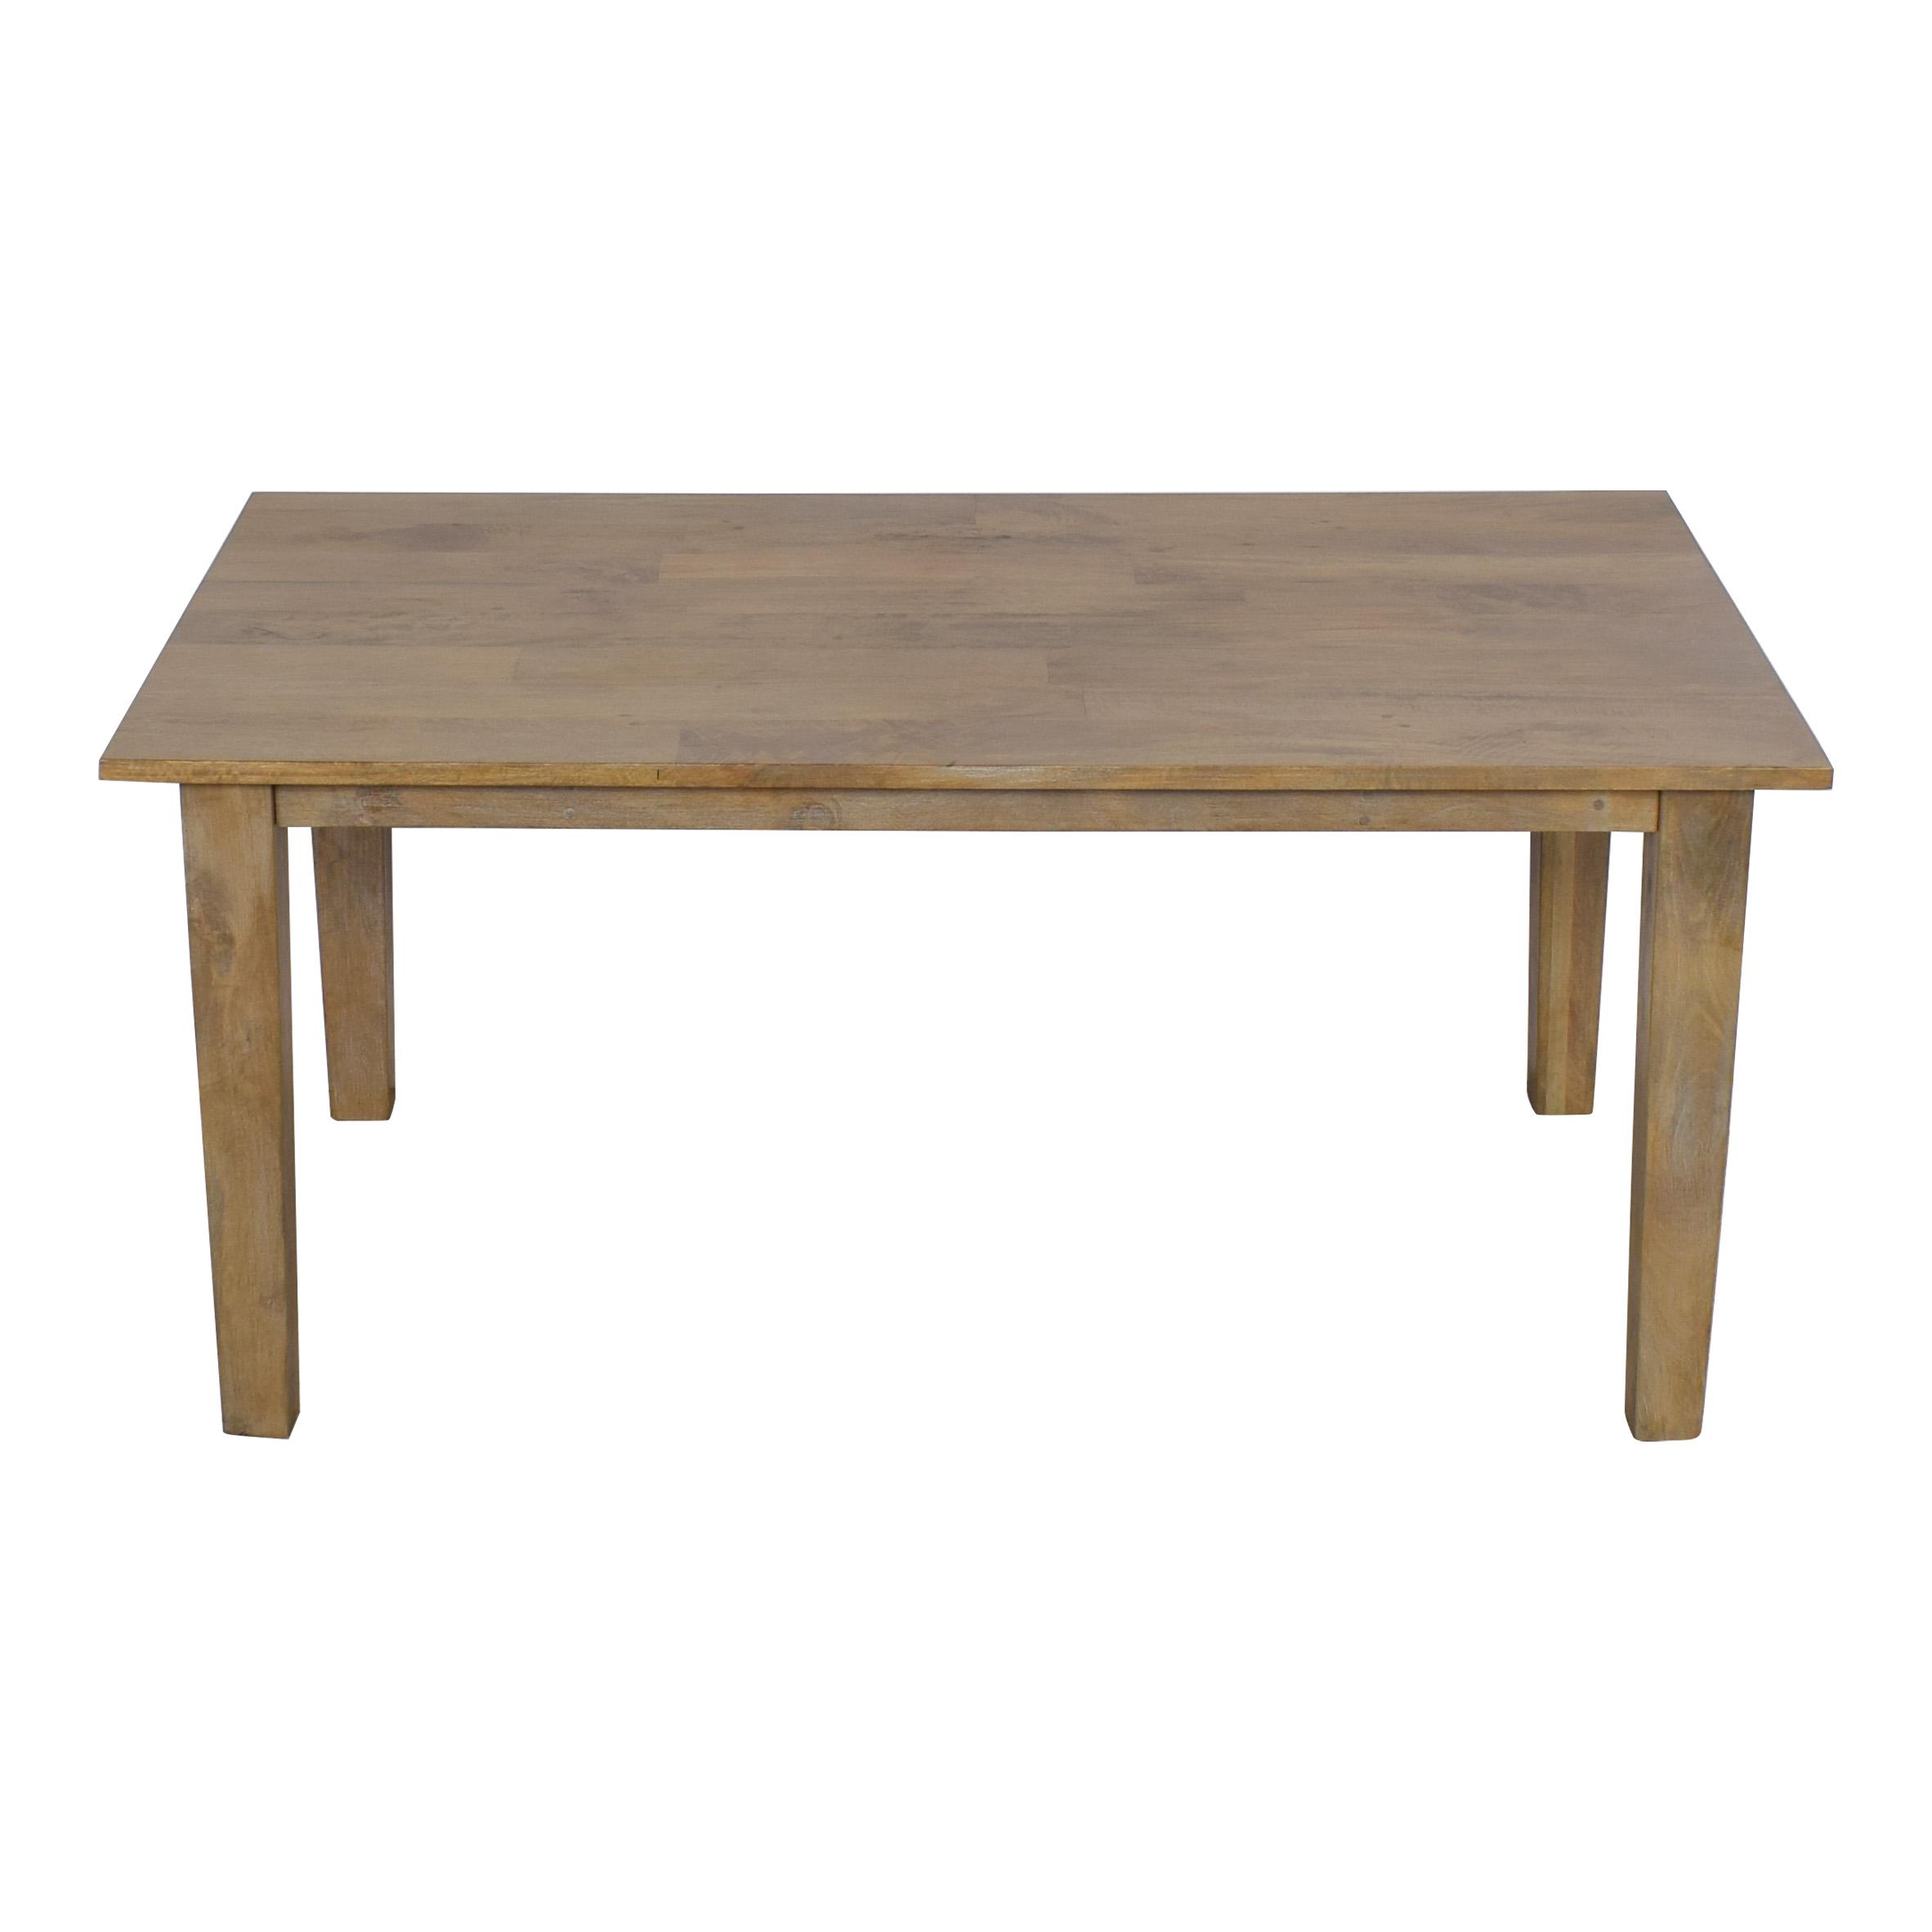 Crate & Barrel Crate & Barrel Basque Grey Wash Dining Table price